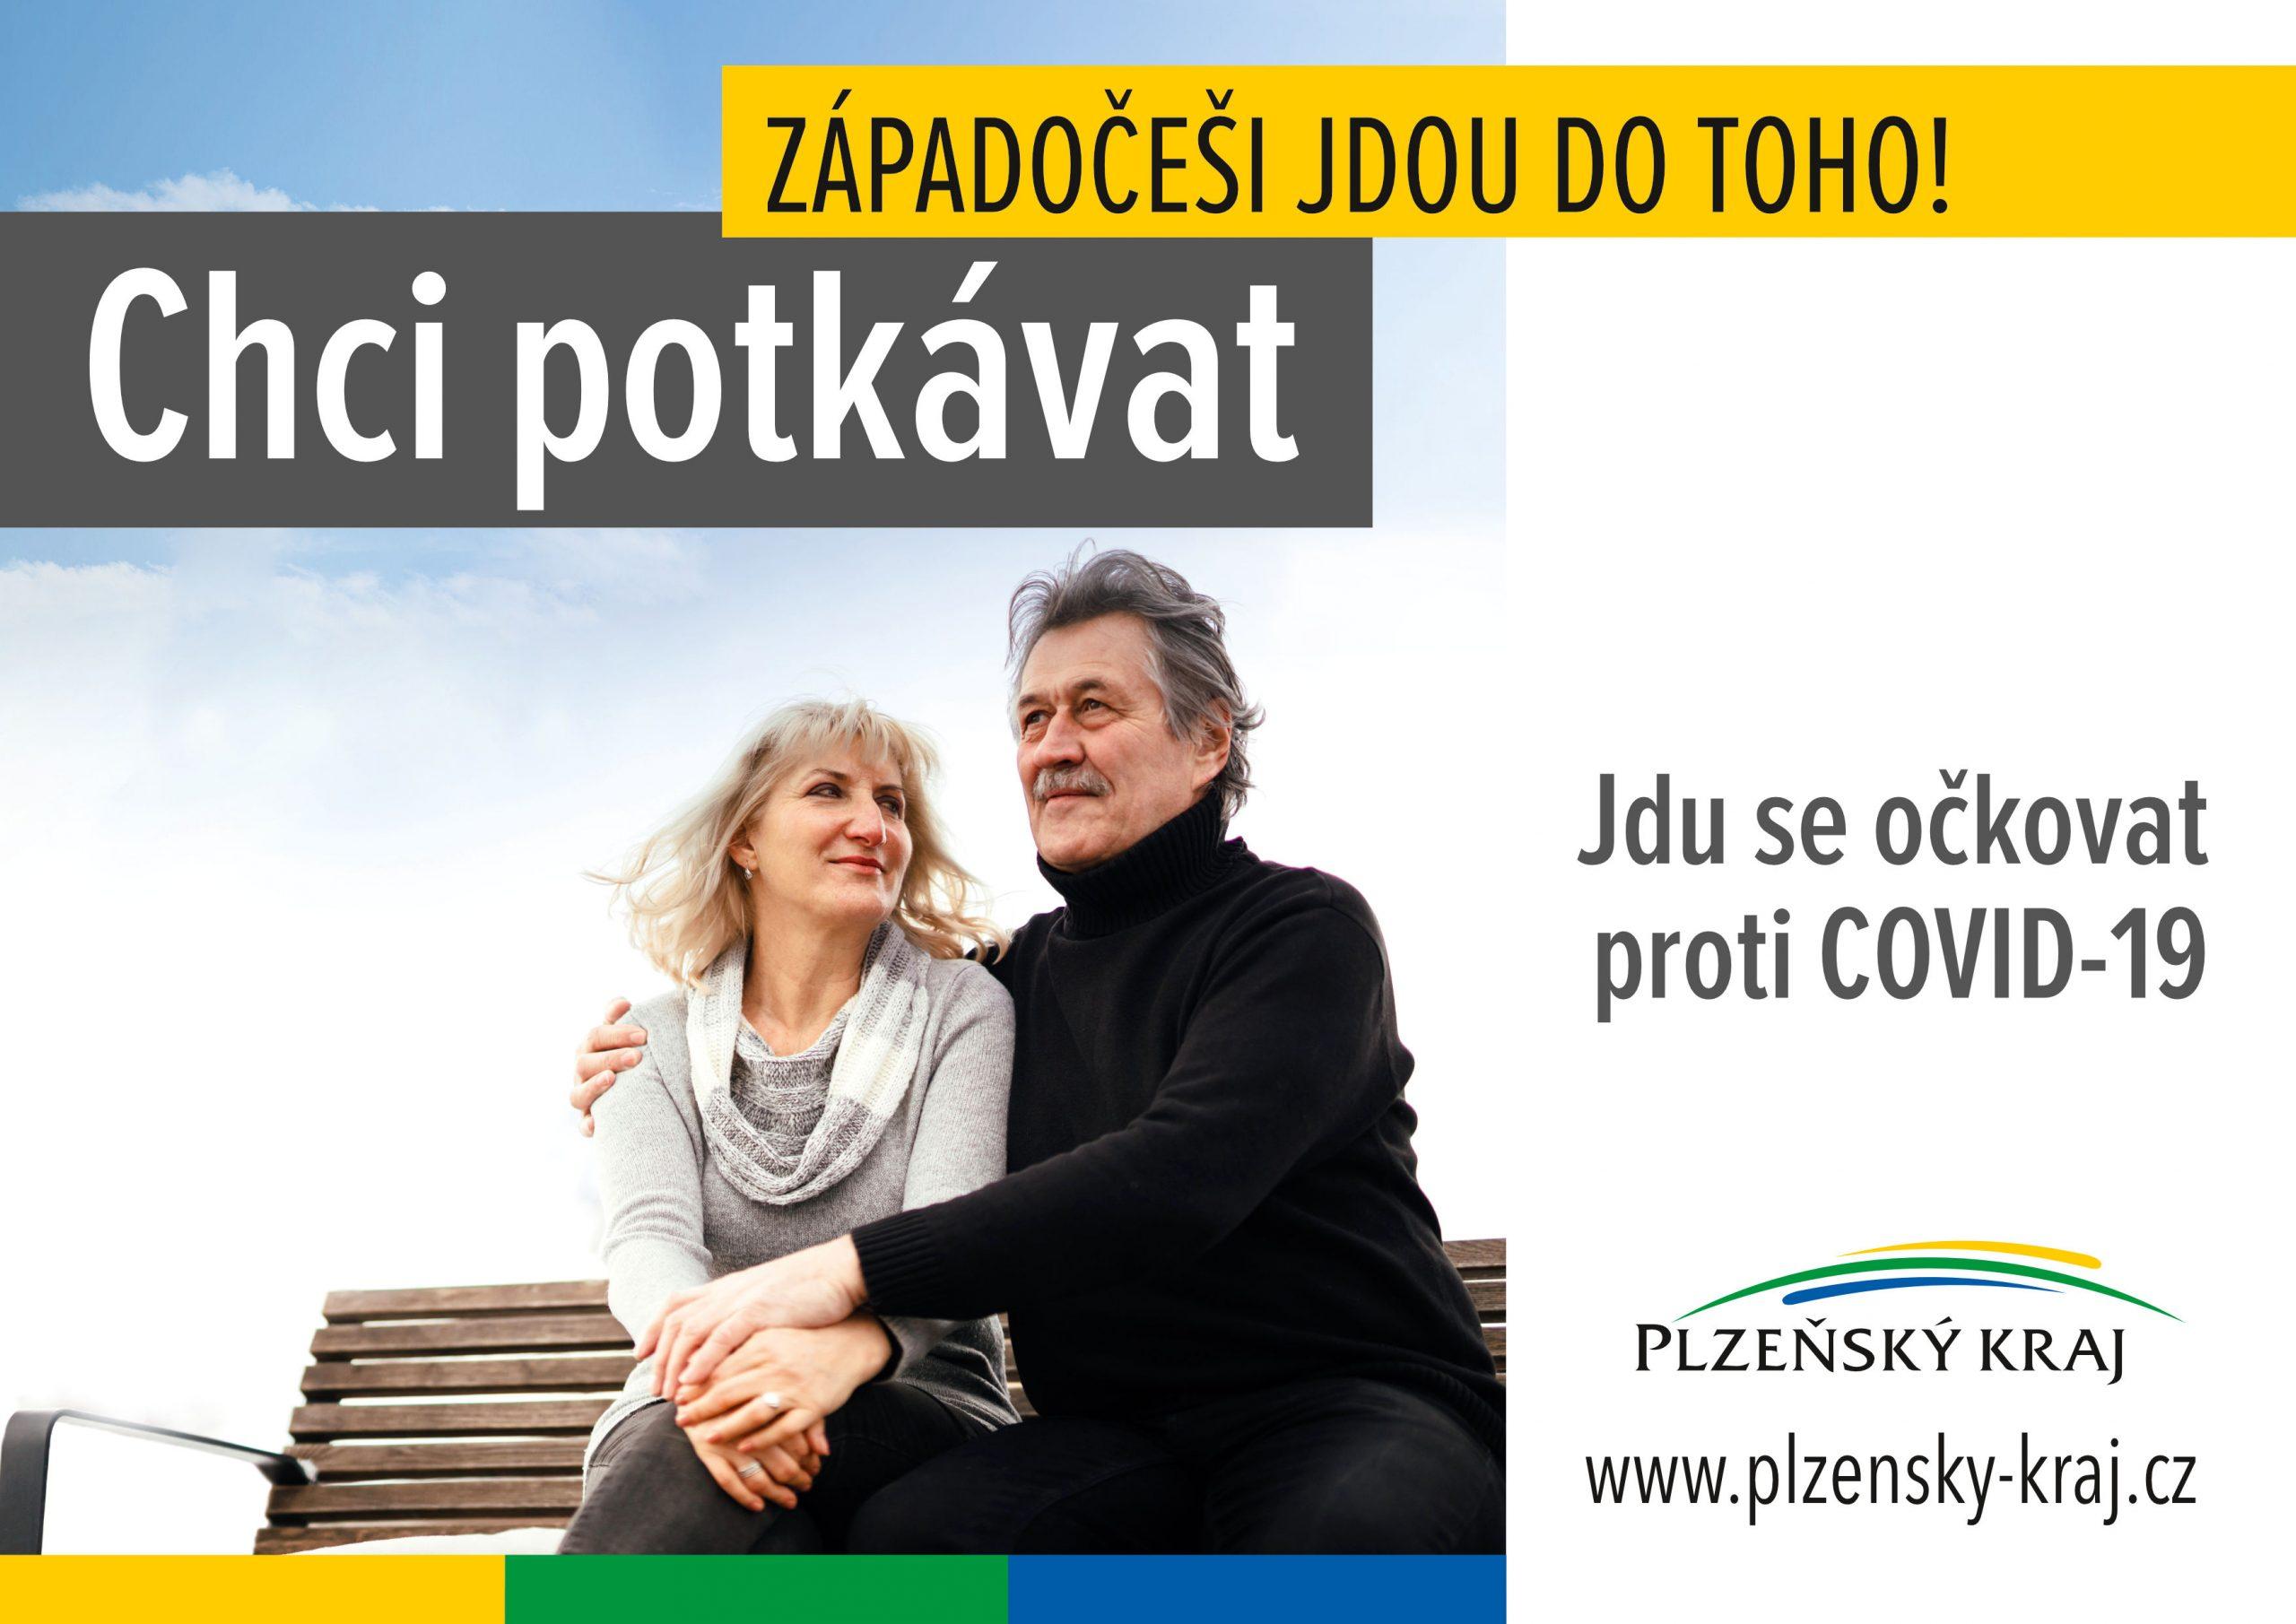 Plzeňský kraj: Chci potkávat! (Dialog Media)